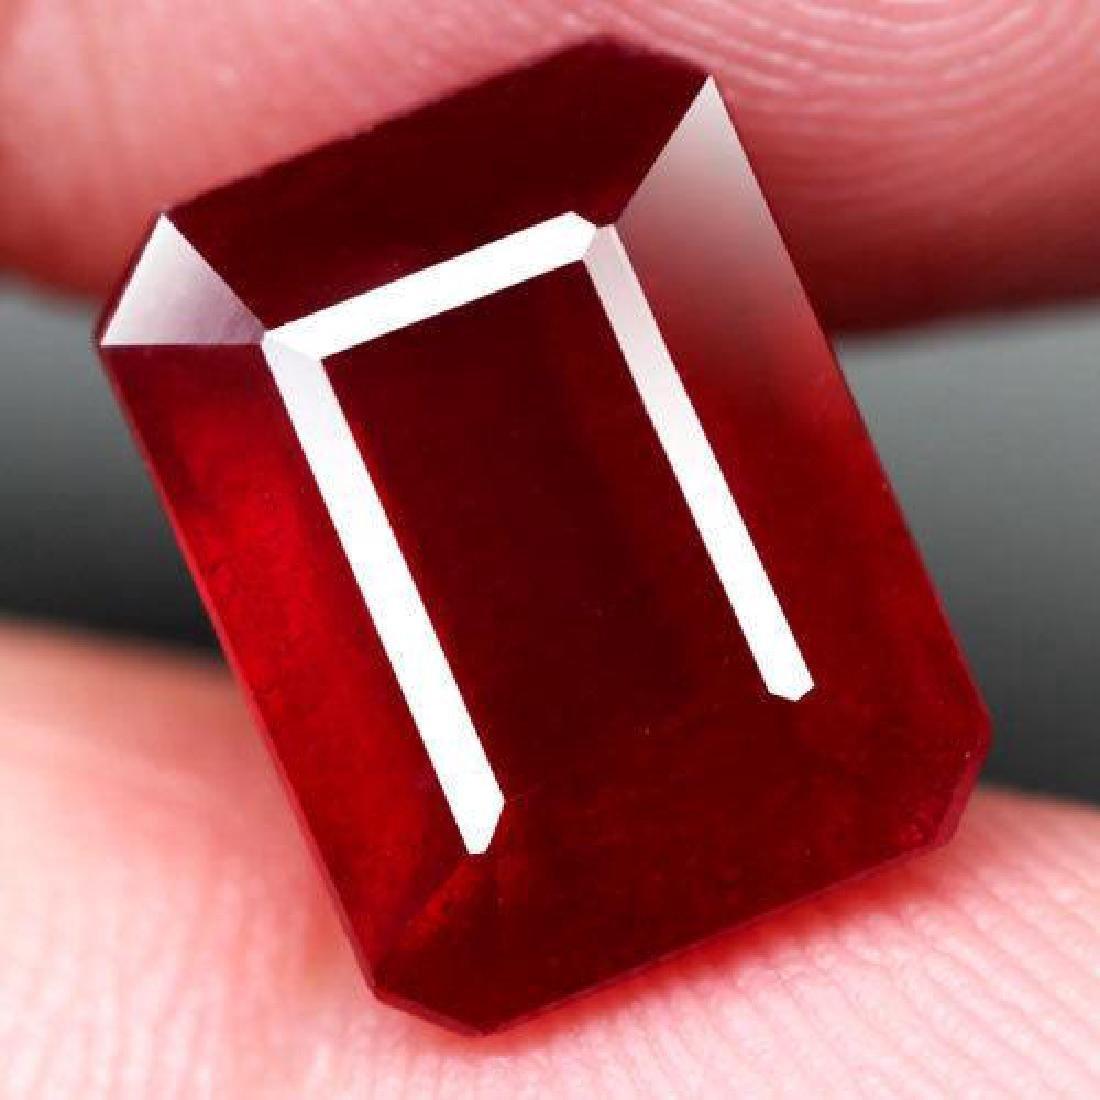 6.98 Carat Composite Loose Ruby